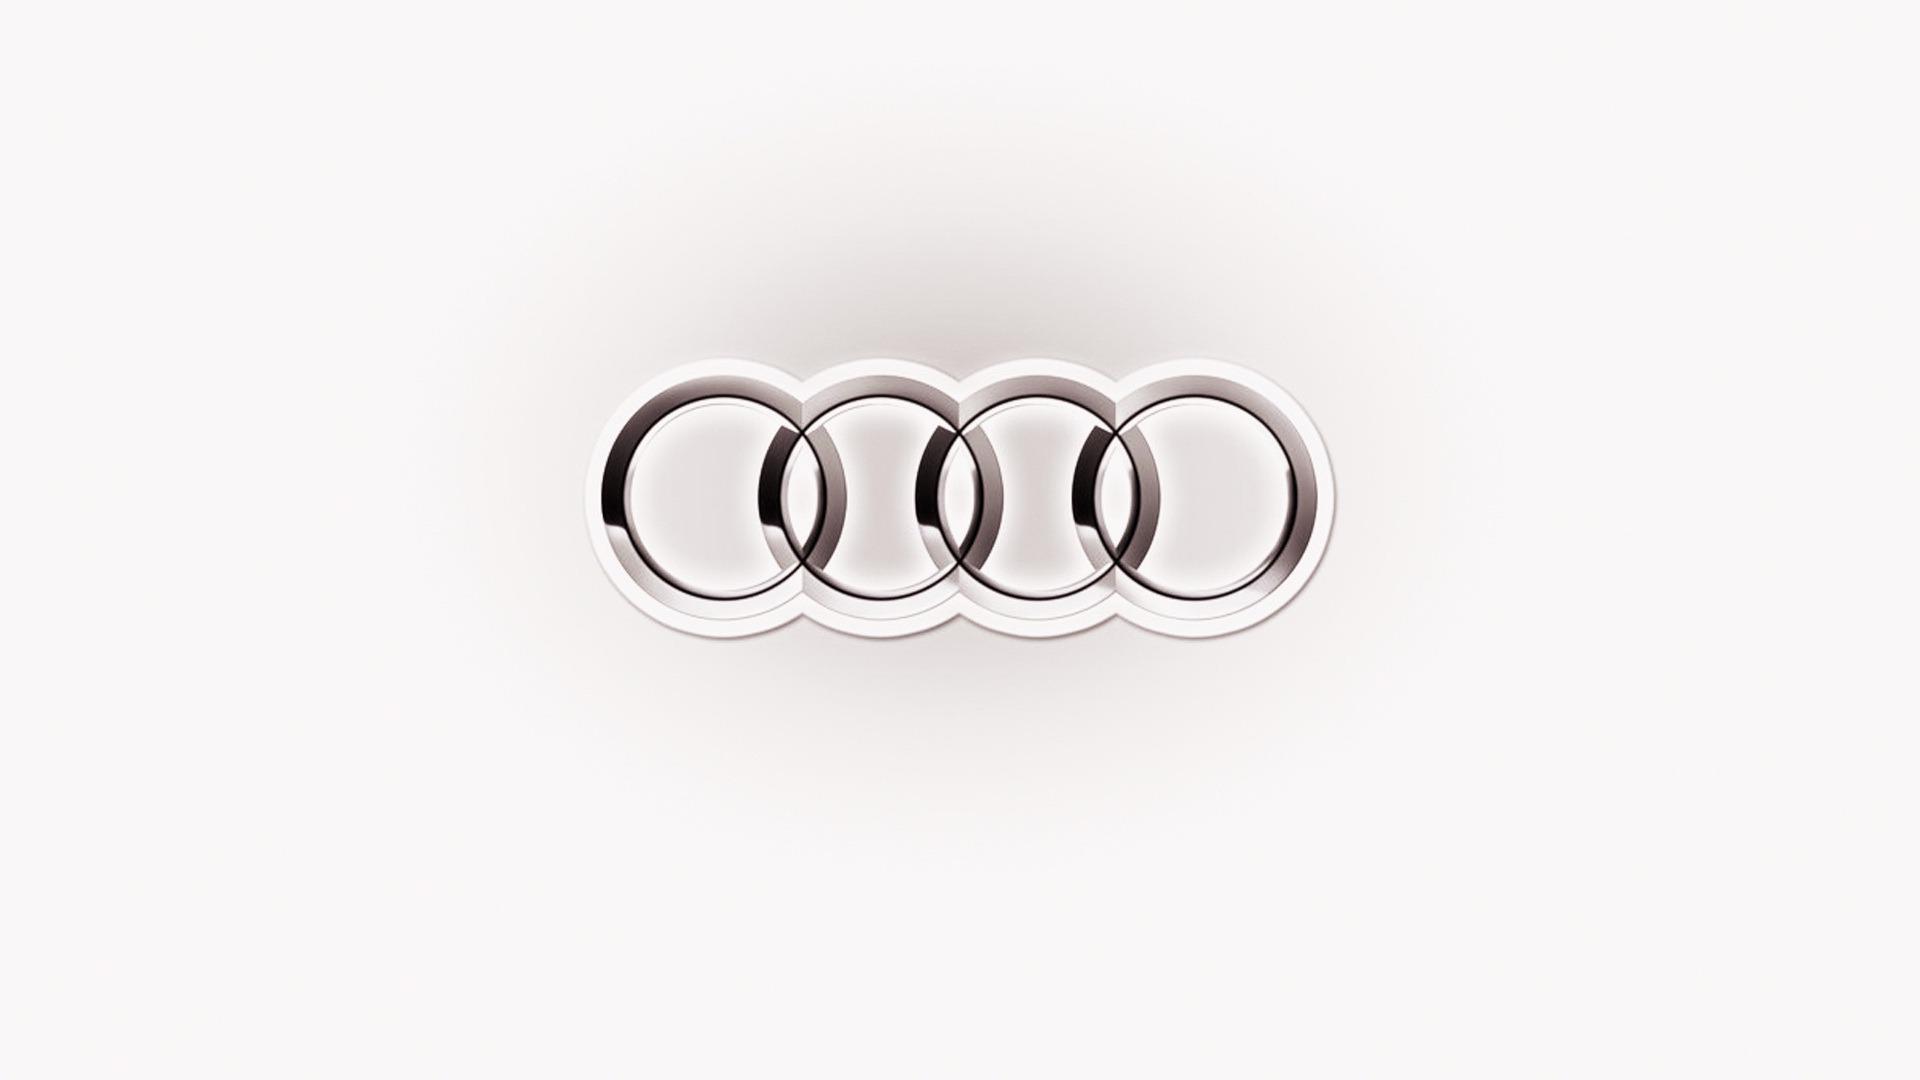 Amazing Audi Car Wallpaper Audi Logo Wallpaper Hd Pixelstalk Net